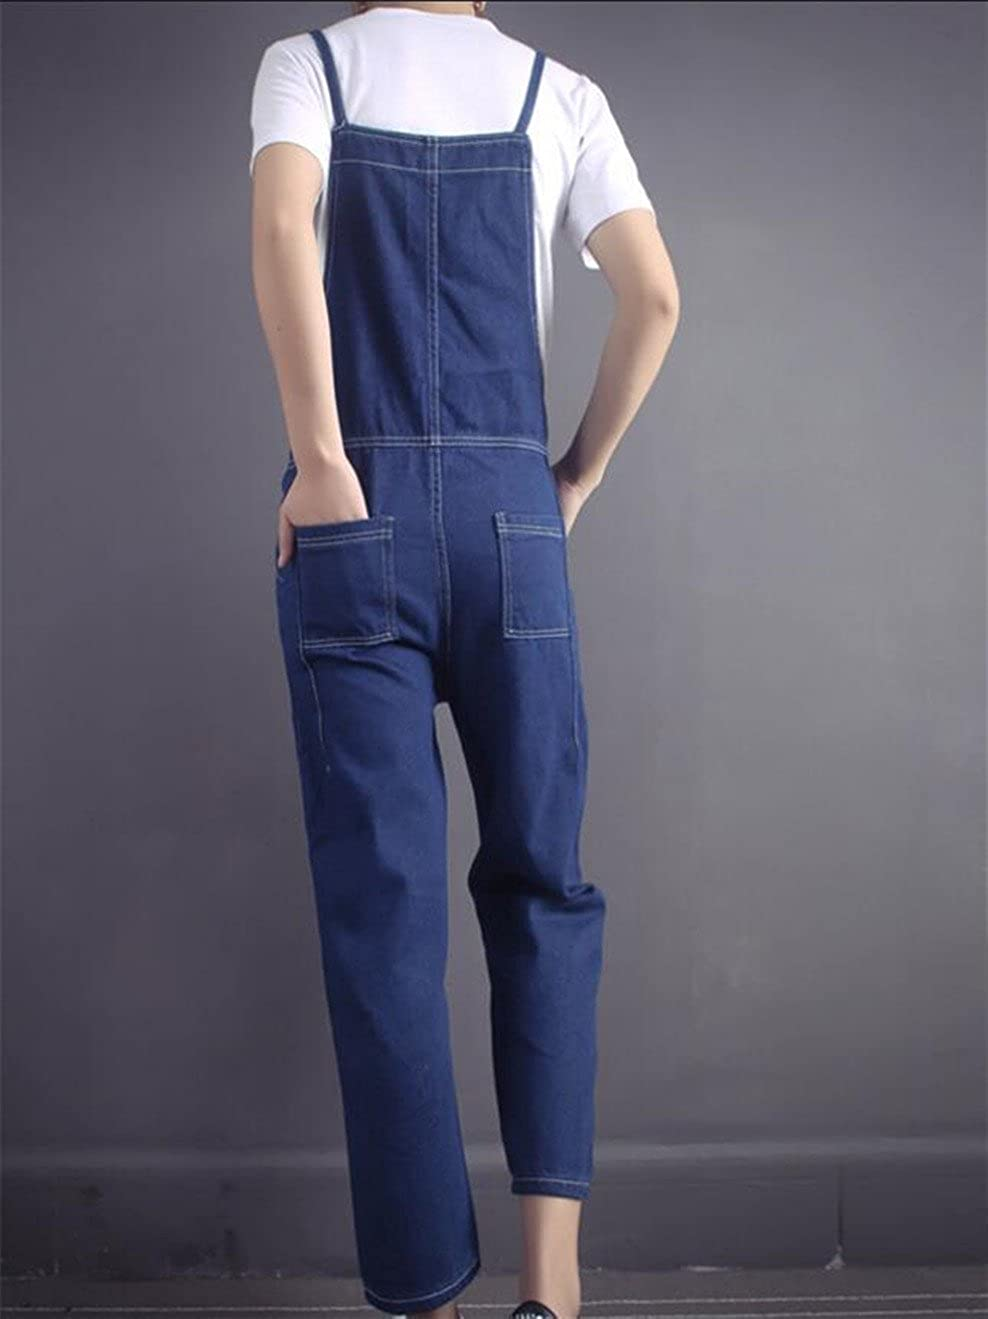 heymoneyWomen heymoney Womens High Waist Jean Cami Splice Lace-up Loose Pockets Bib